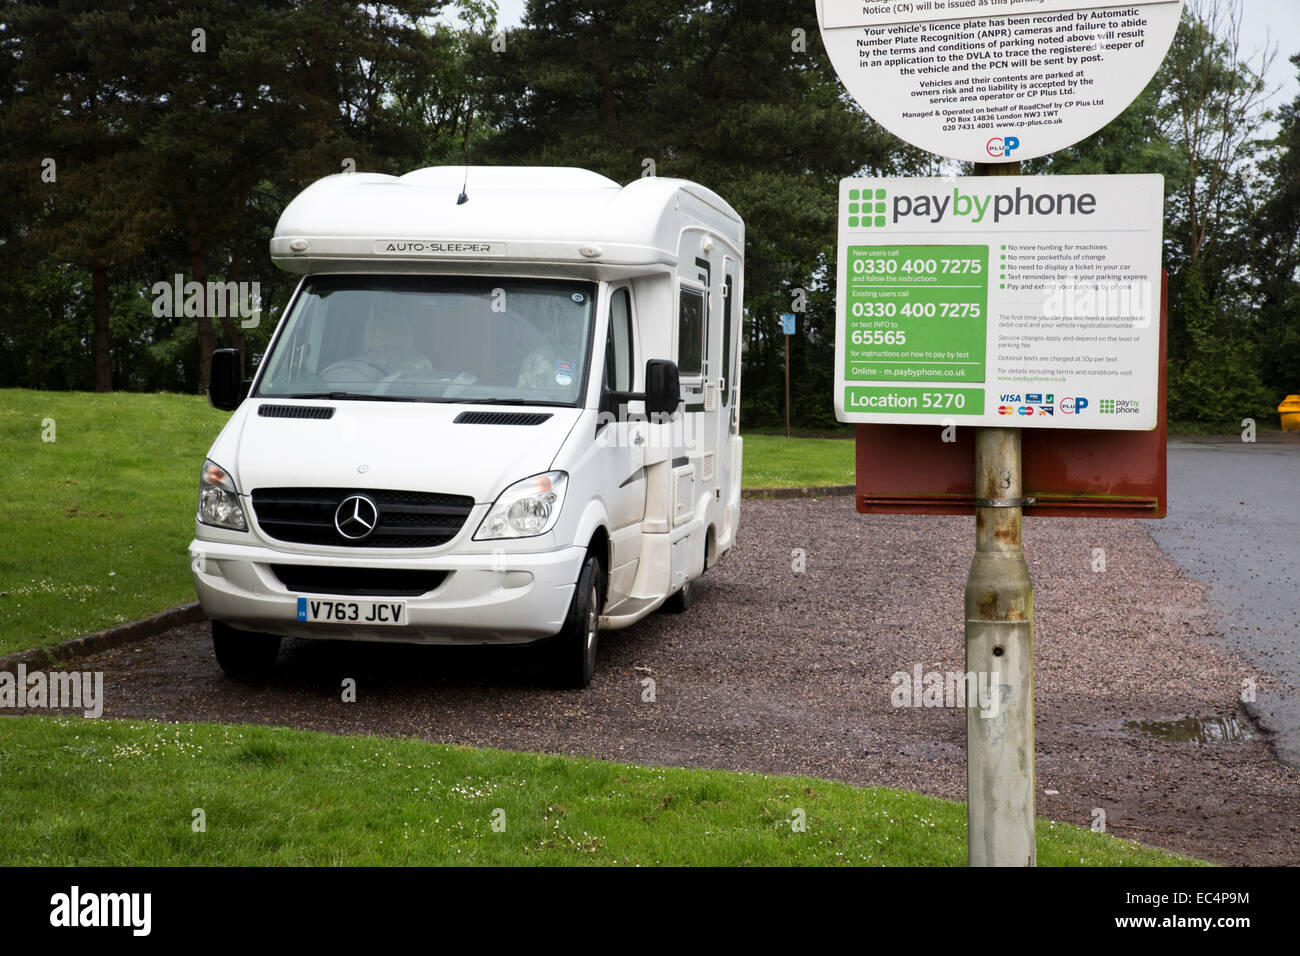 Taunton Deane Services; M5; Van Parked; UK - Stock Image